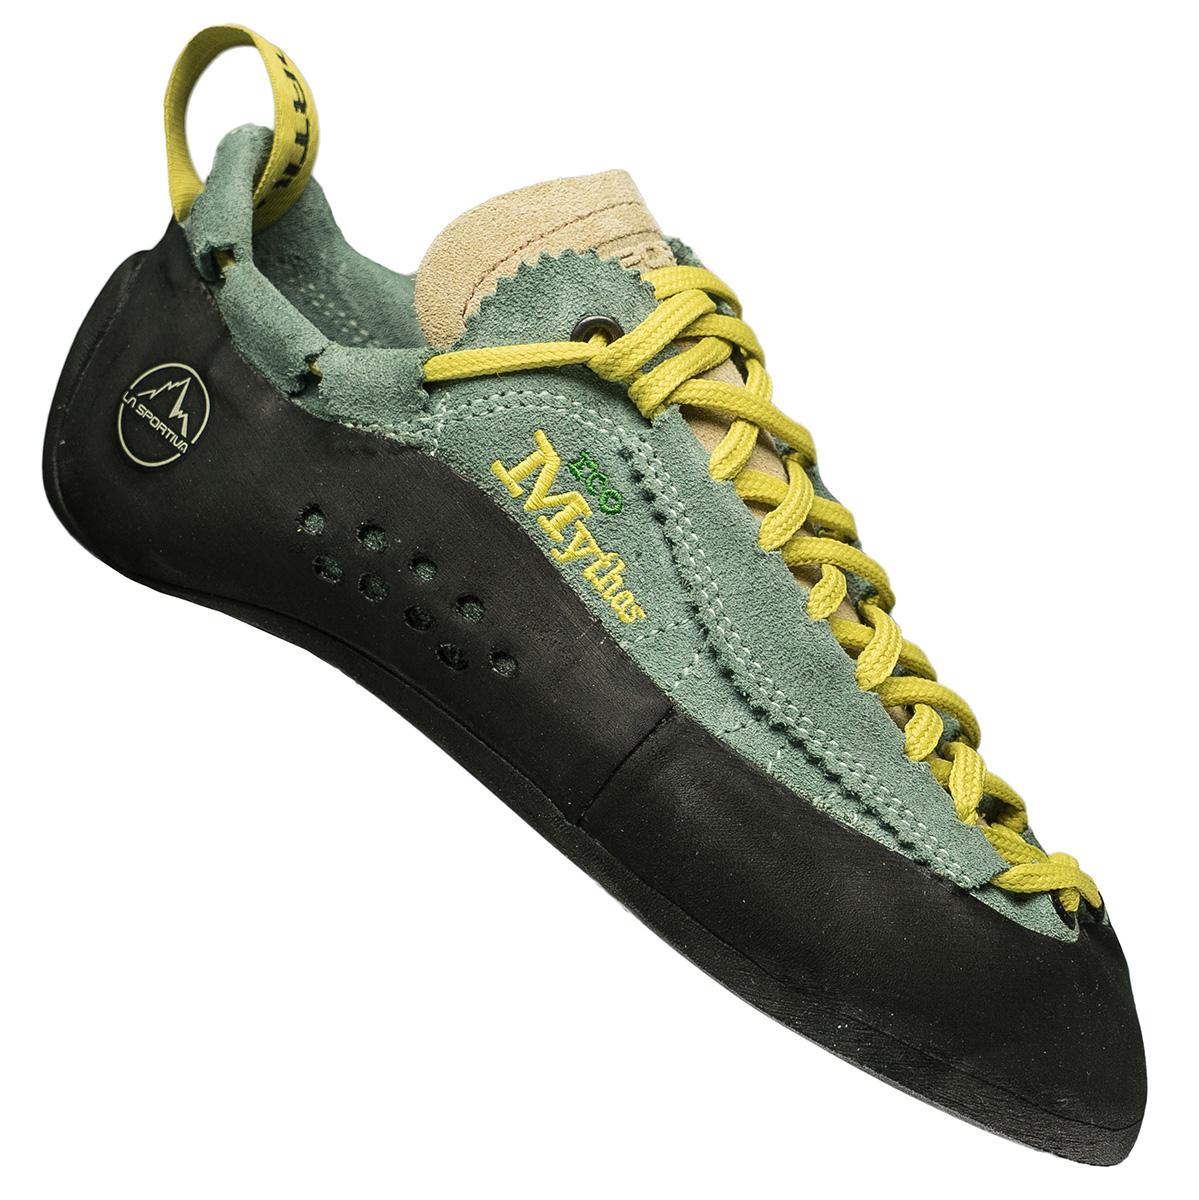 mythos eco eco friendly climbing shoe. Black Bedroom Furniture Sets. Home Design Ideas